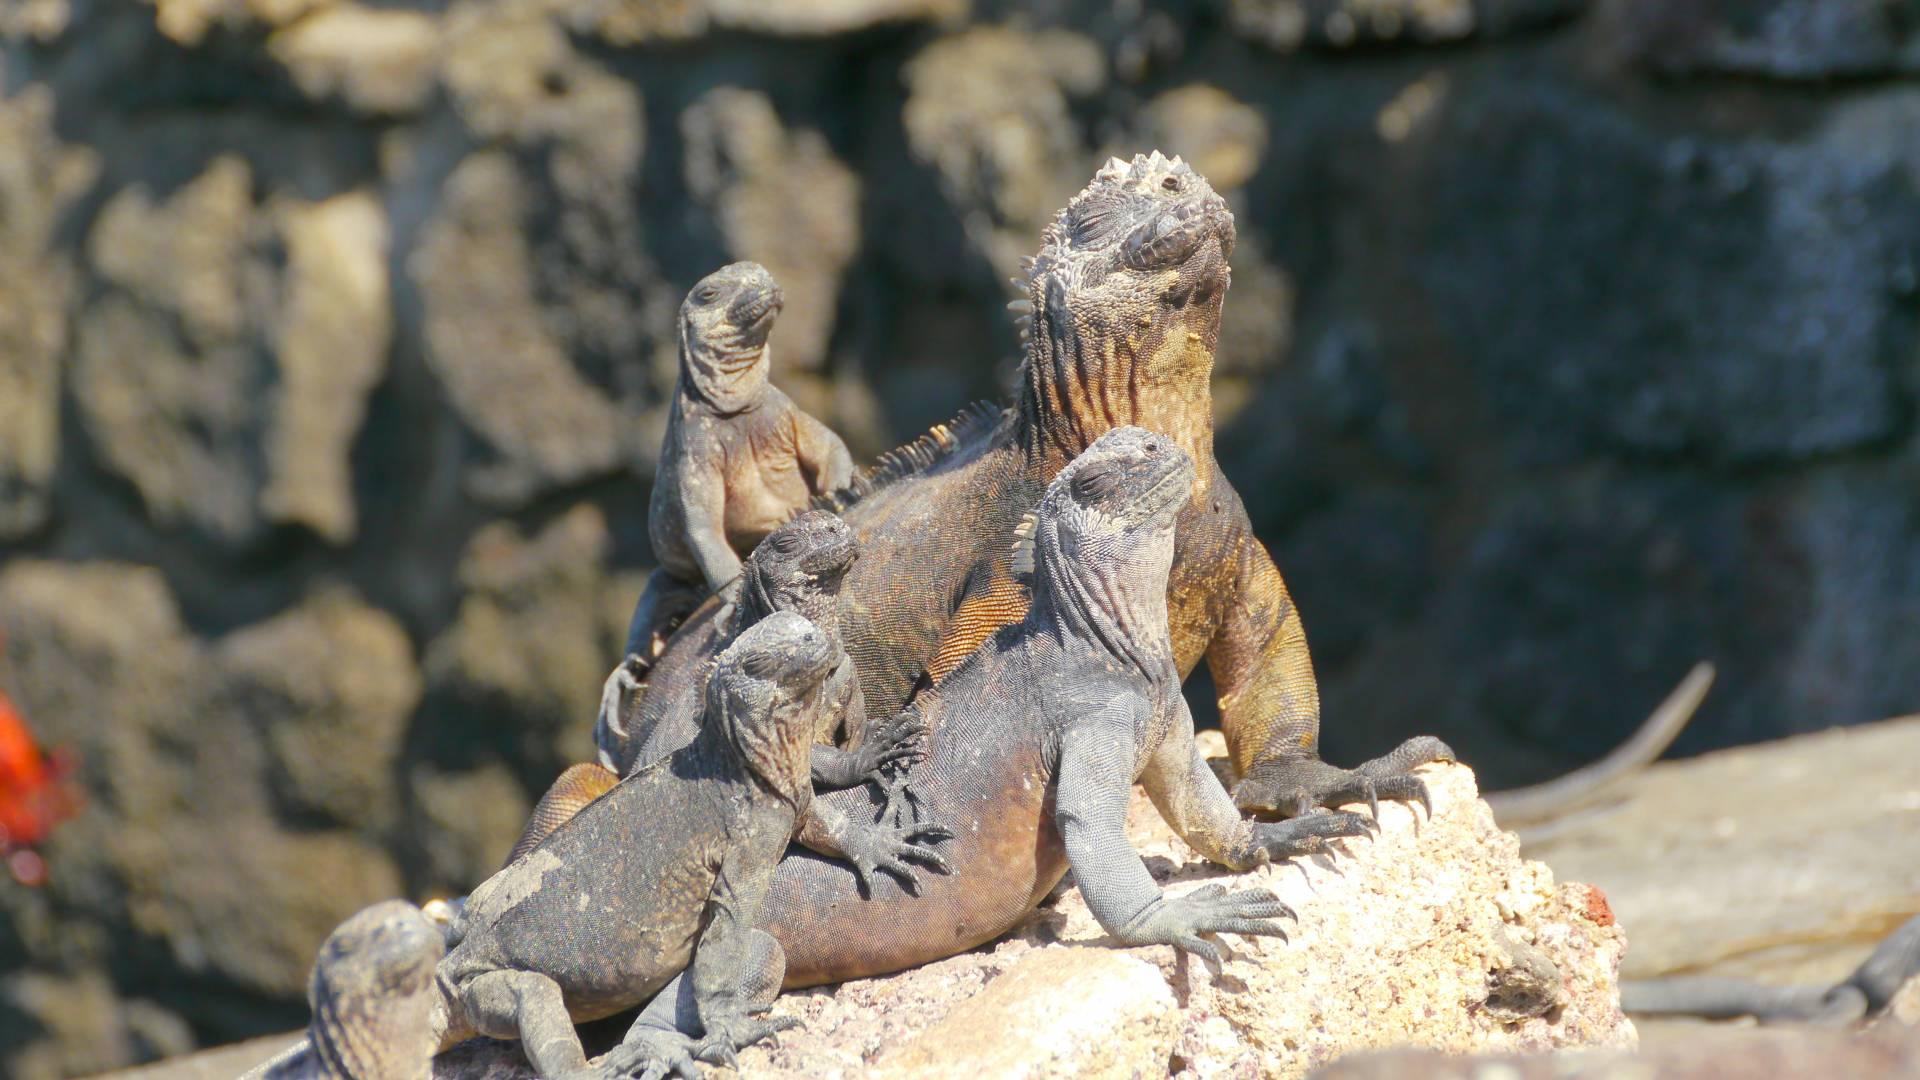 Galapagos-Inseln - Meerechsen beim Sonnenbaden